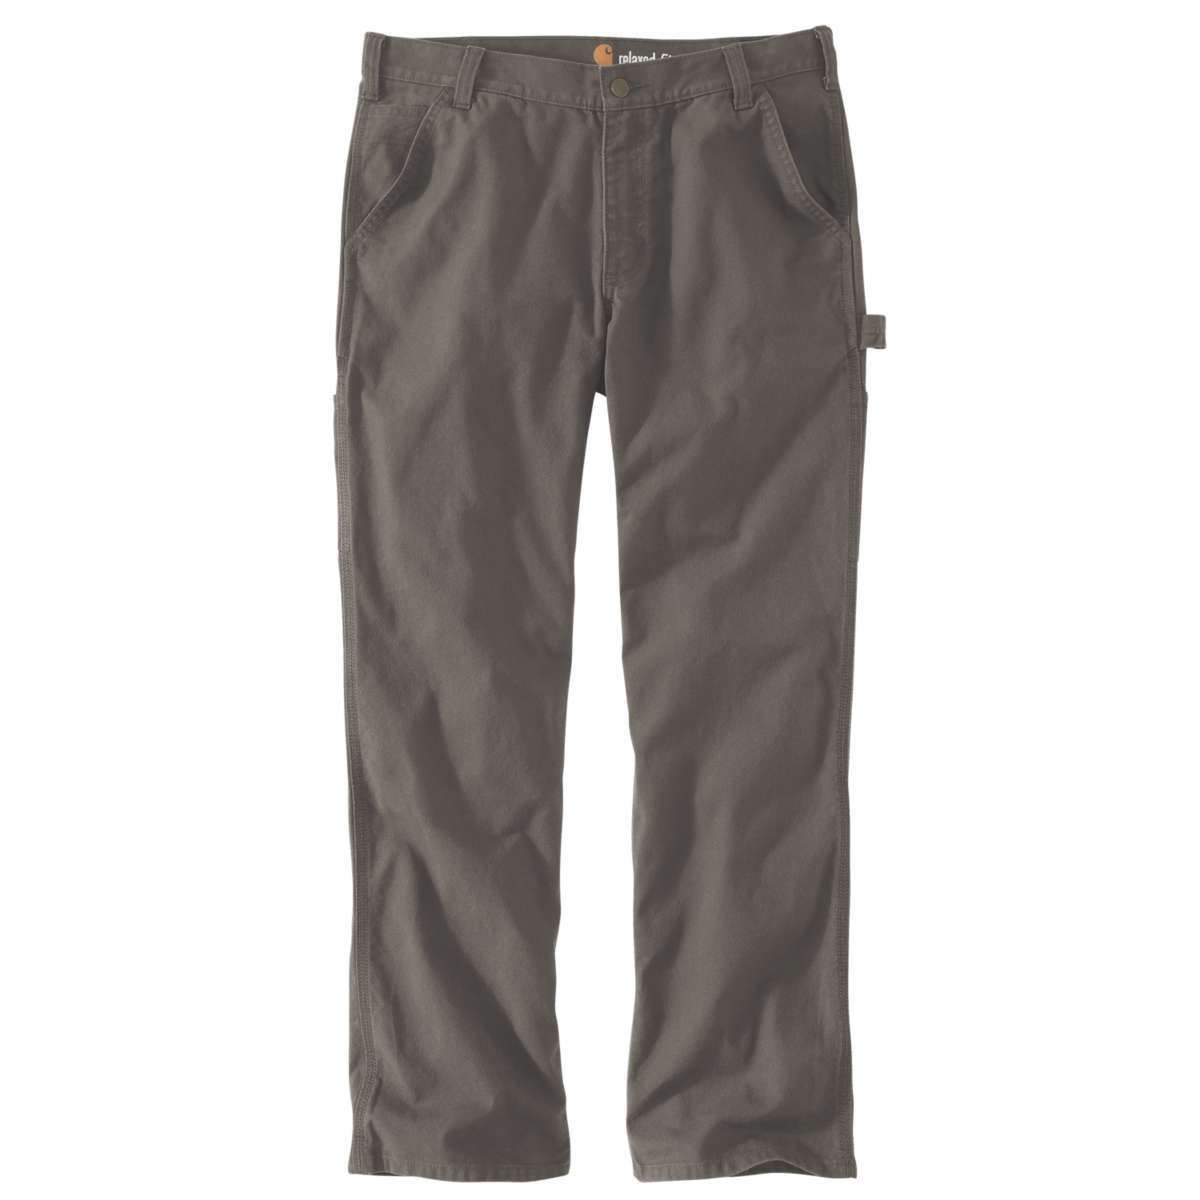 Carhartt Men's Rugged Flex Relaxed Fit Duck Dungaree Work Pants - Brown, 32/30